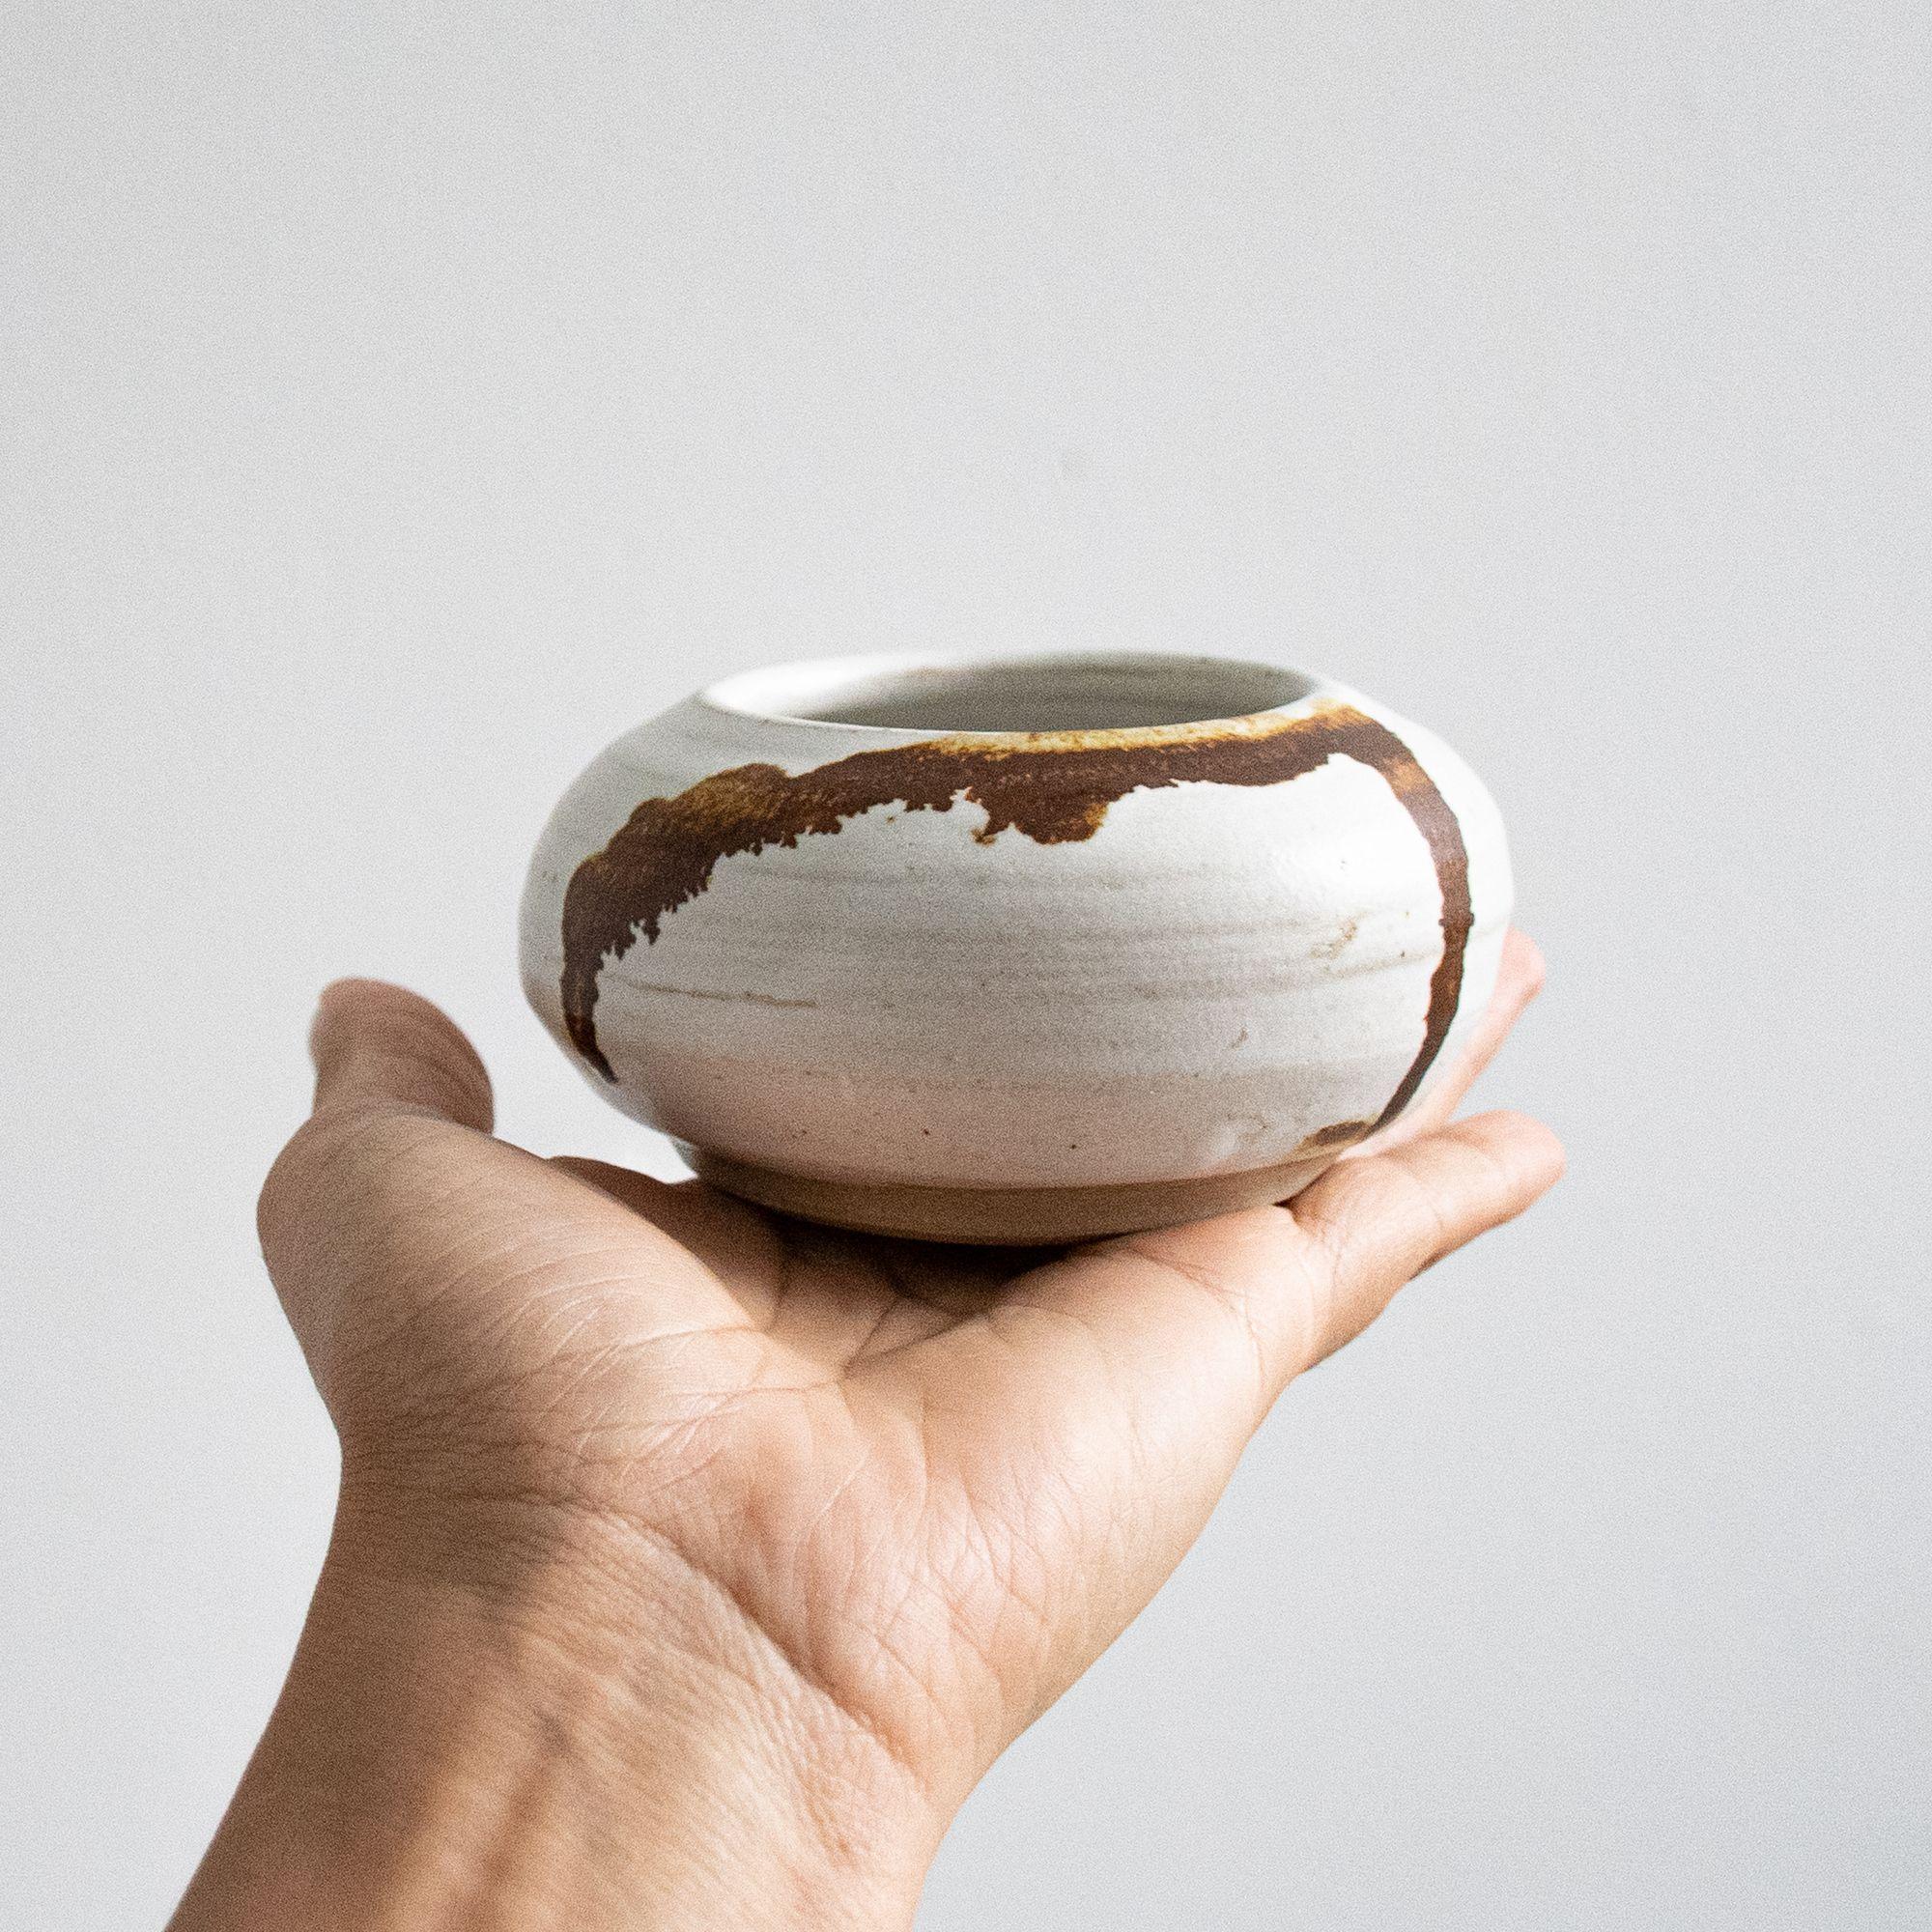 Pottery #potteryclasses Pottery class #pottery #ceramics #bowl #wheelthrownpottery #handmadepottery #potterylove #handmade #handmadecrafts #handmadeceramics #clay #wheelthrown #glaze #vessel #potteryclasses